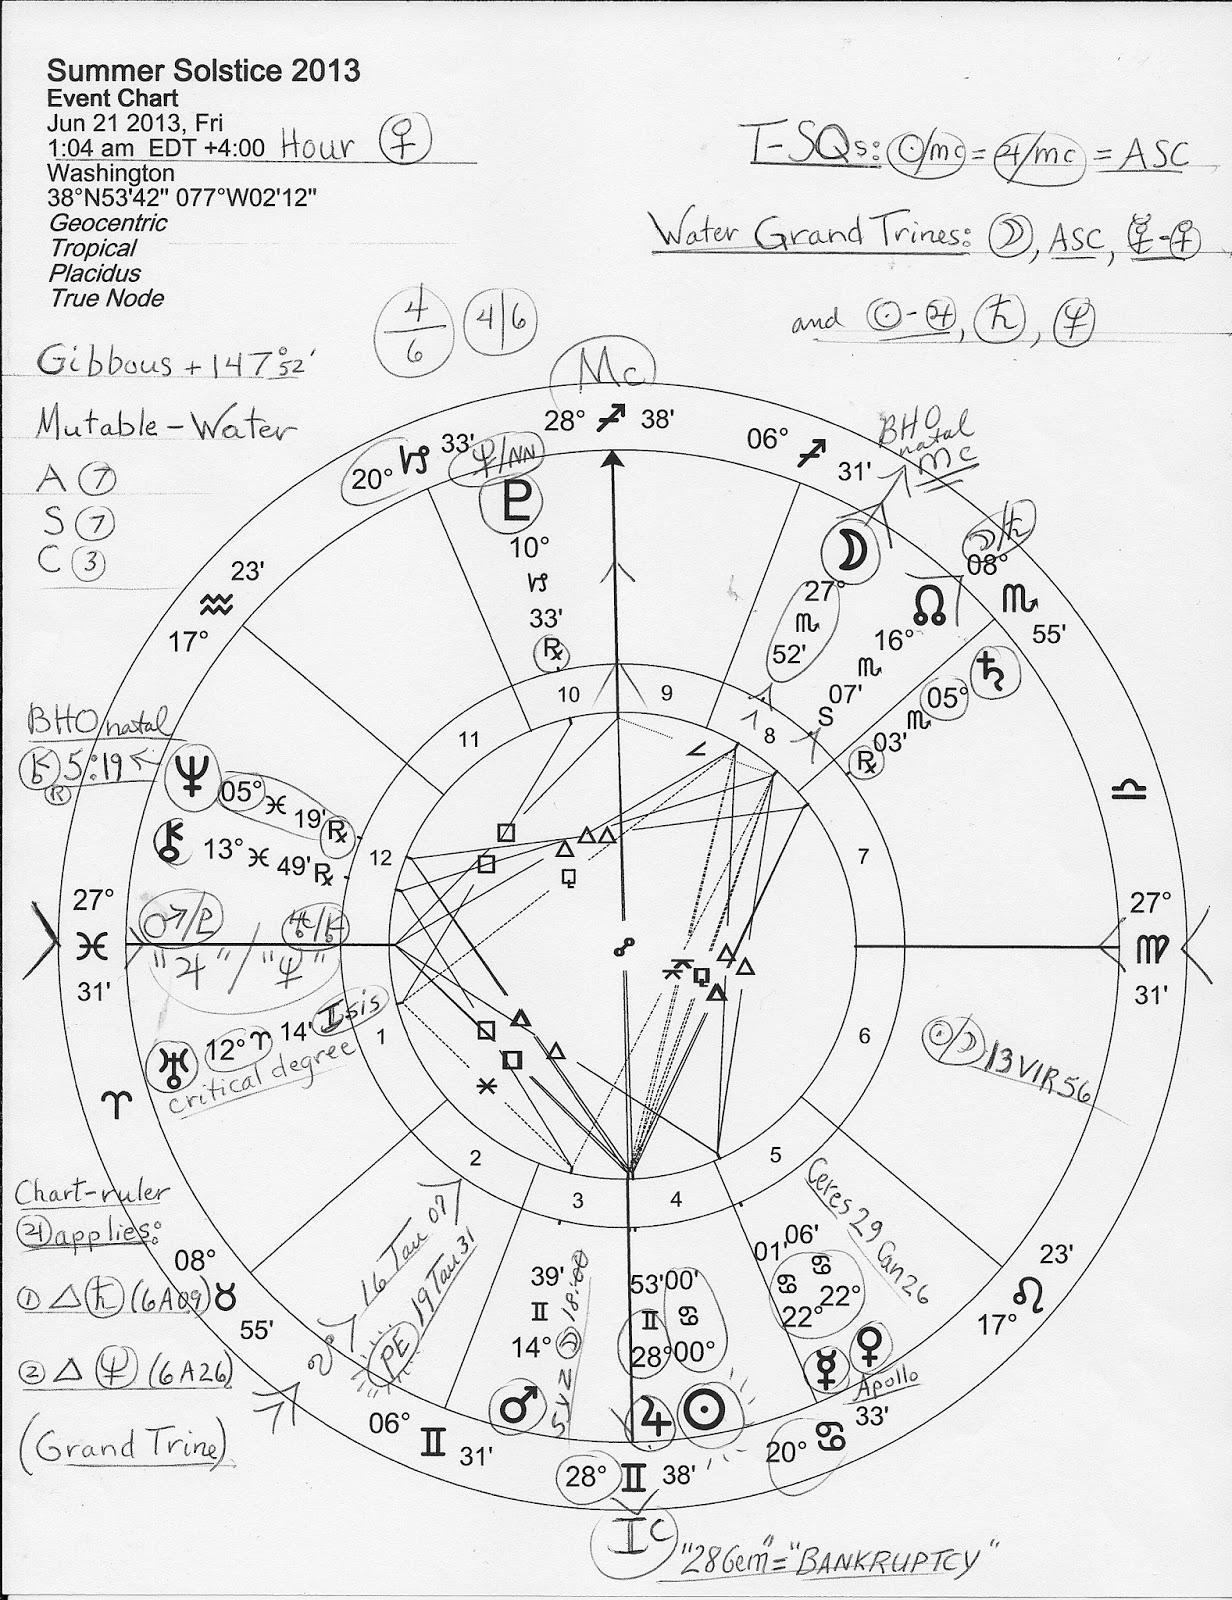 Sun Hr Chart